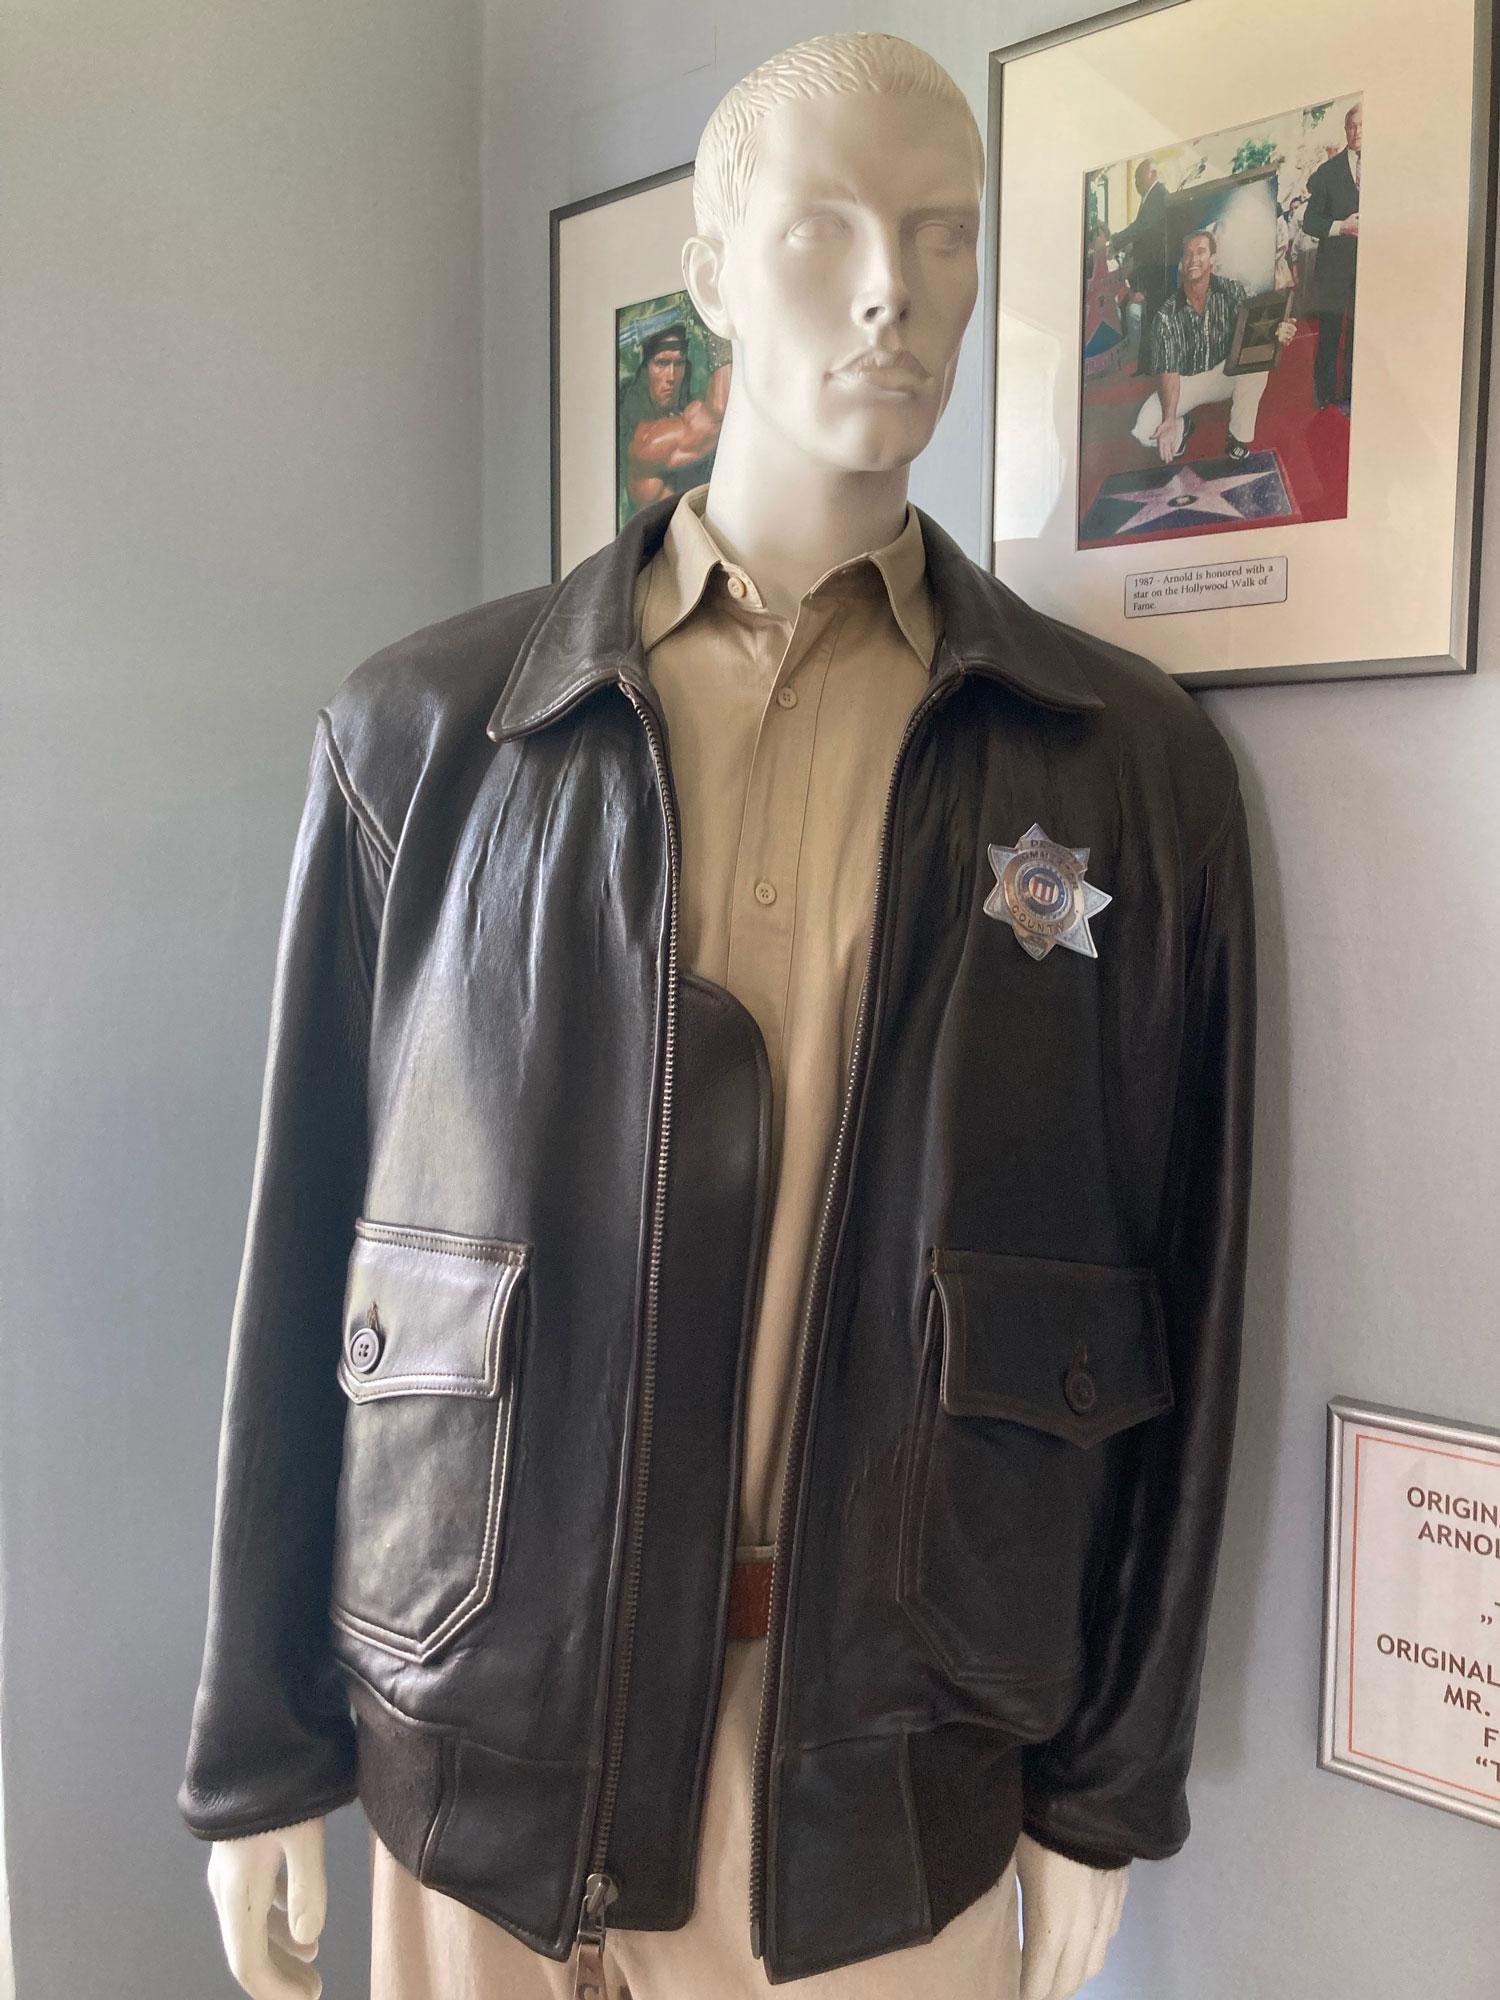 Arnold Schwarzenegger Museum The Last Stand Jacket